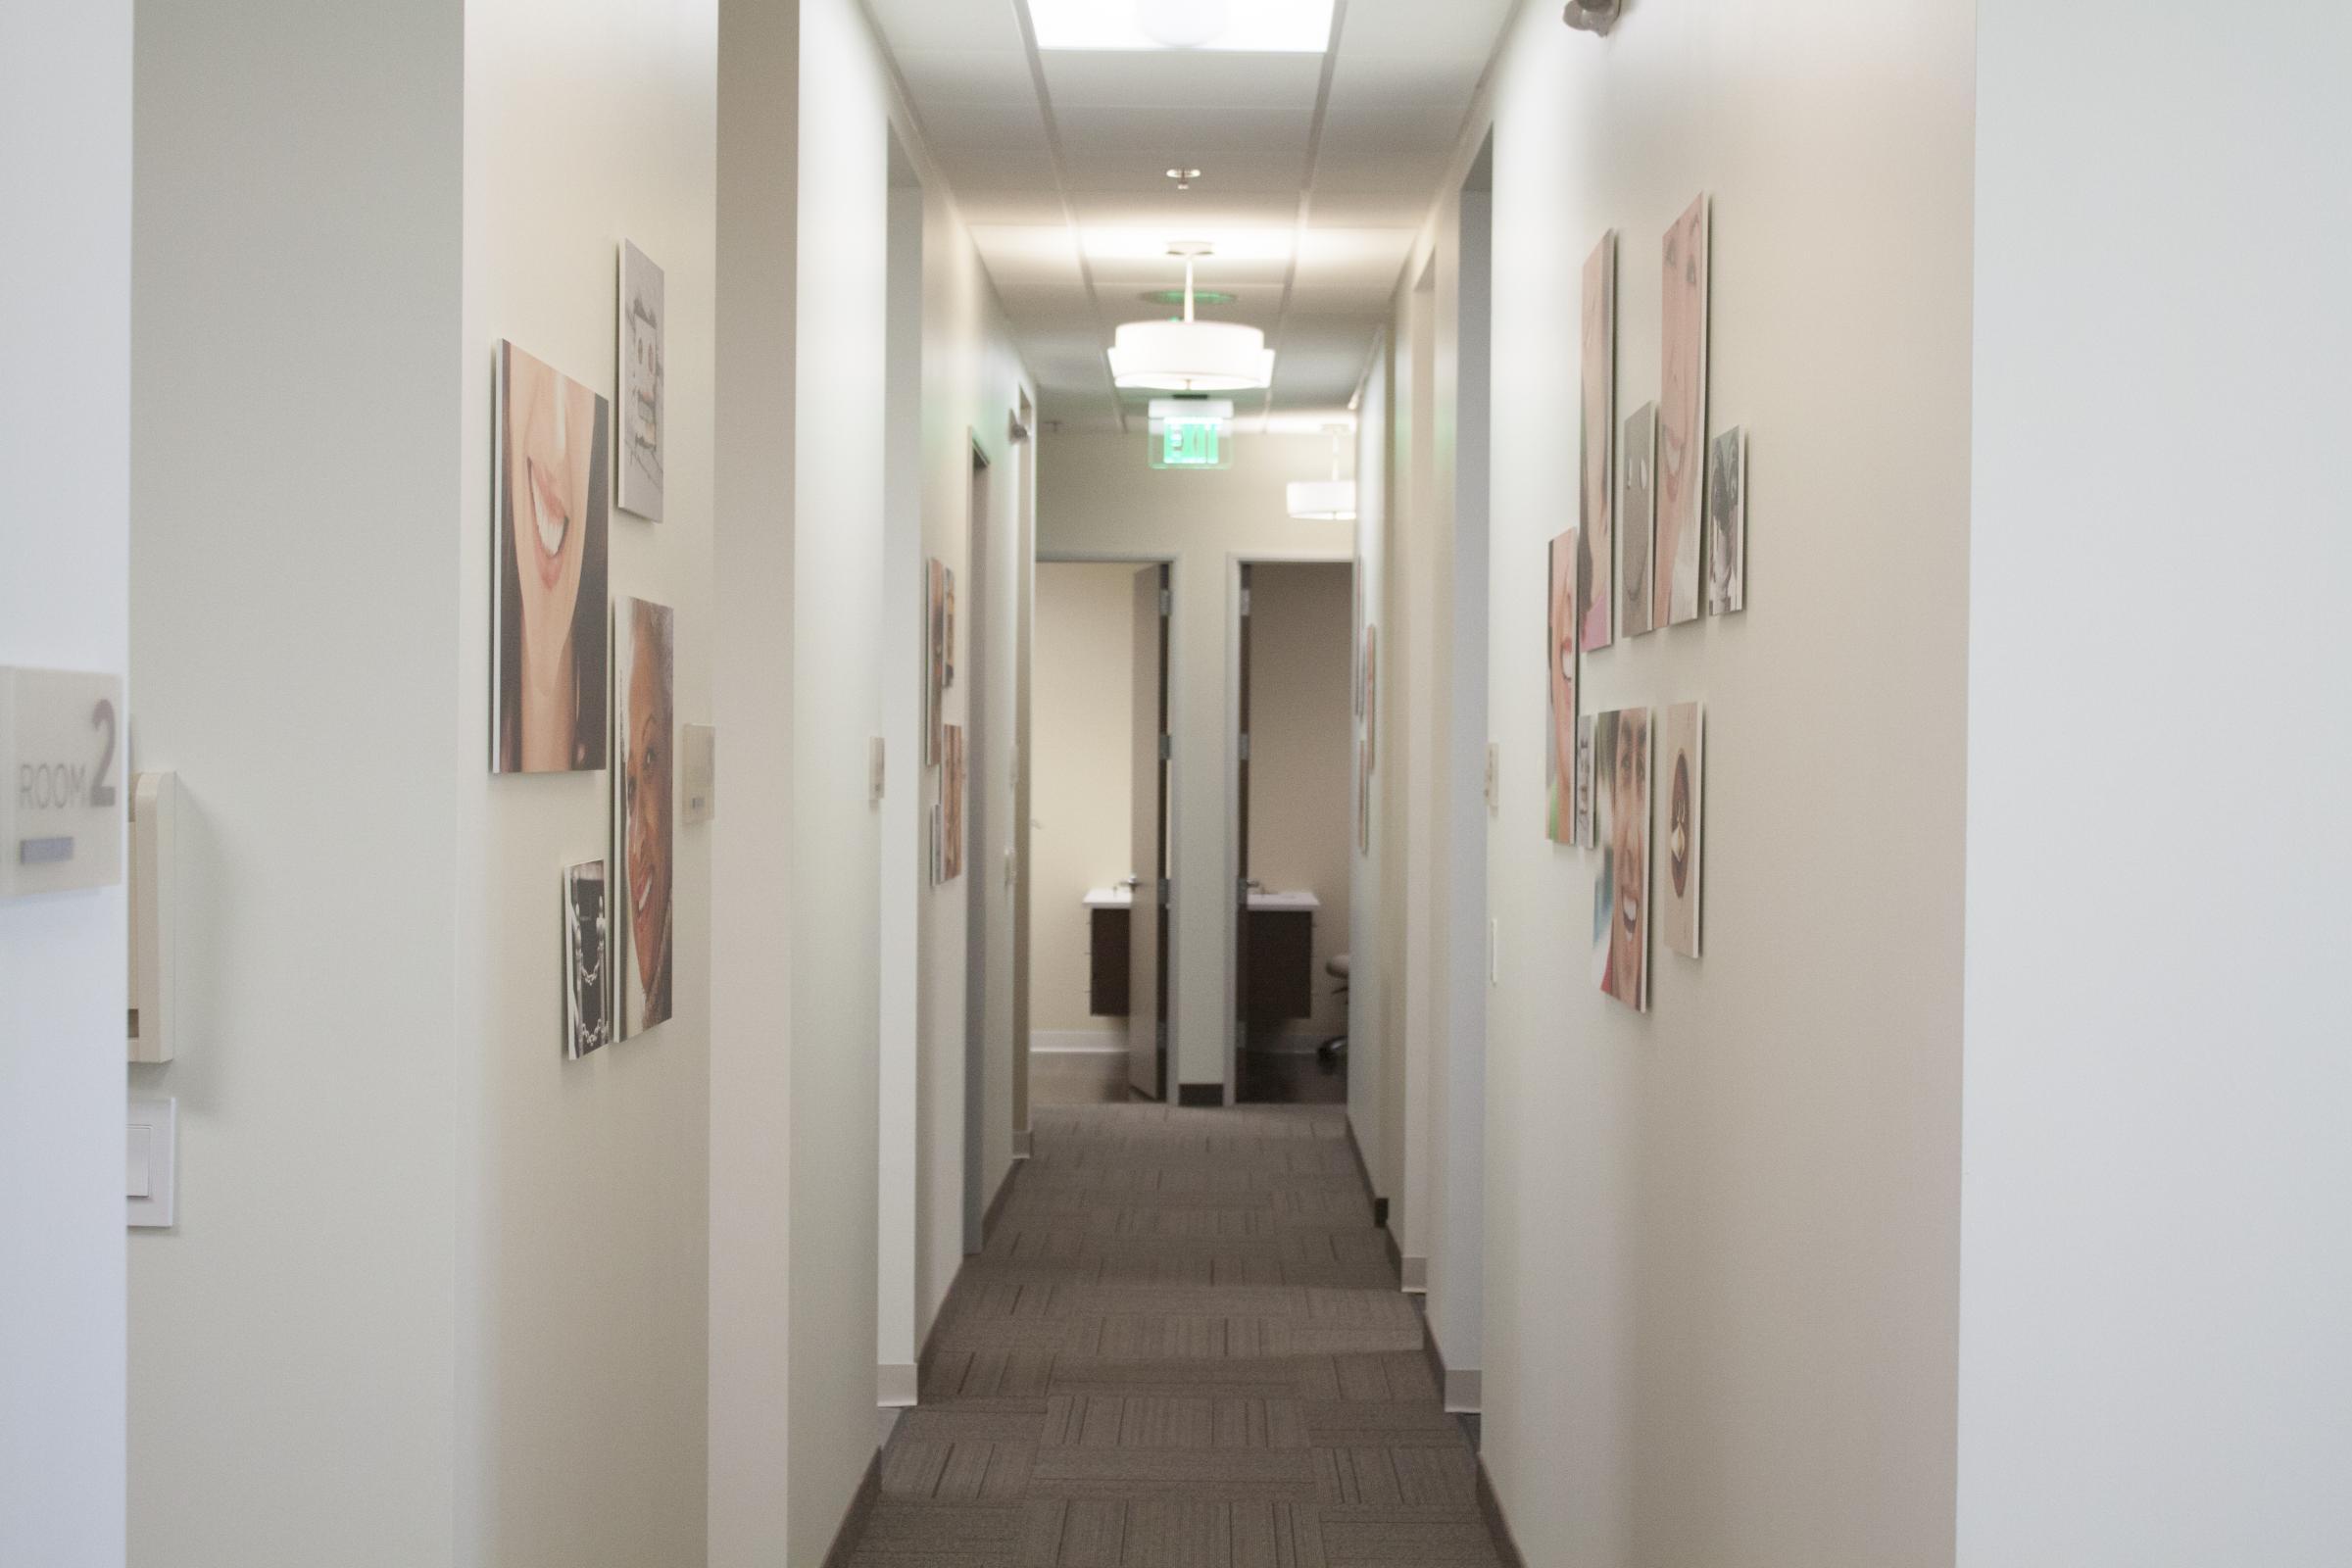 Cartersville Dentist Office image 4